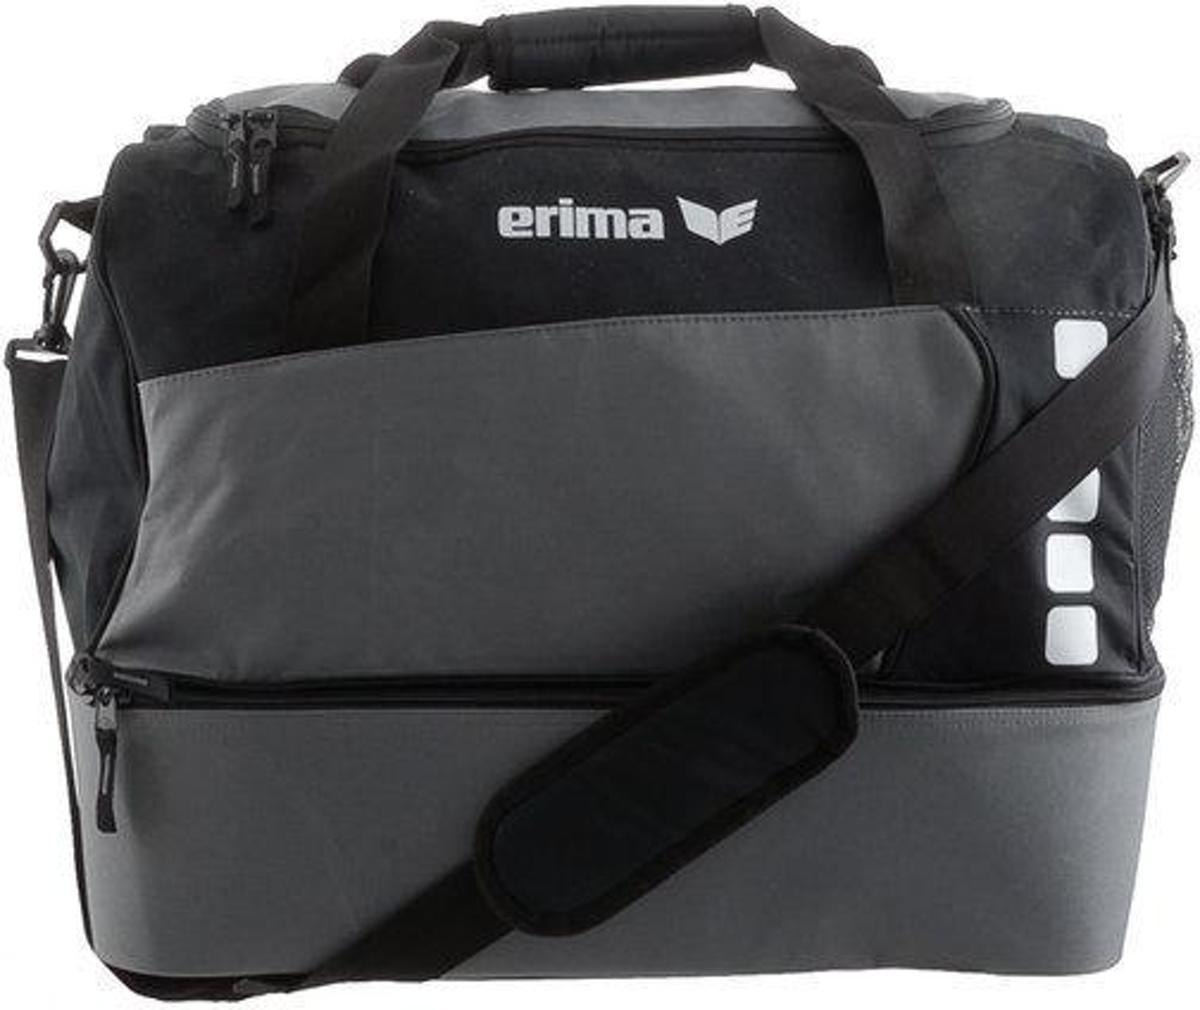 0c215add850 bol.com   Erima Club 5 Line Sporttas met Bodemvak Small - Graniet/Zwart